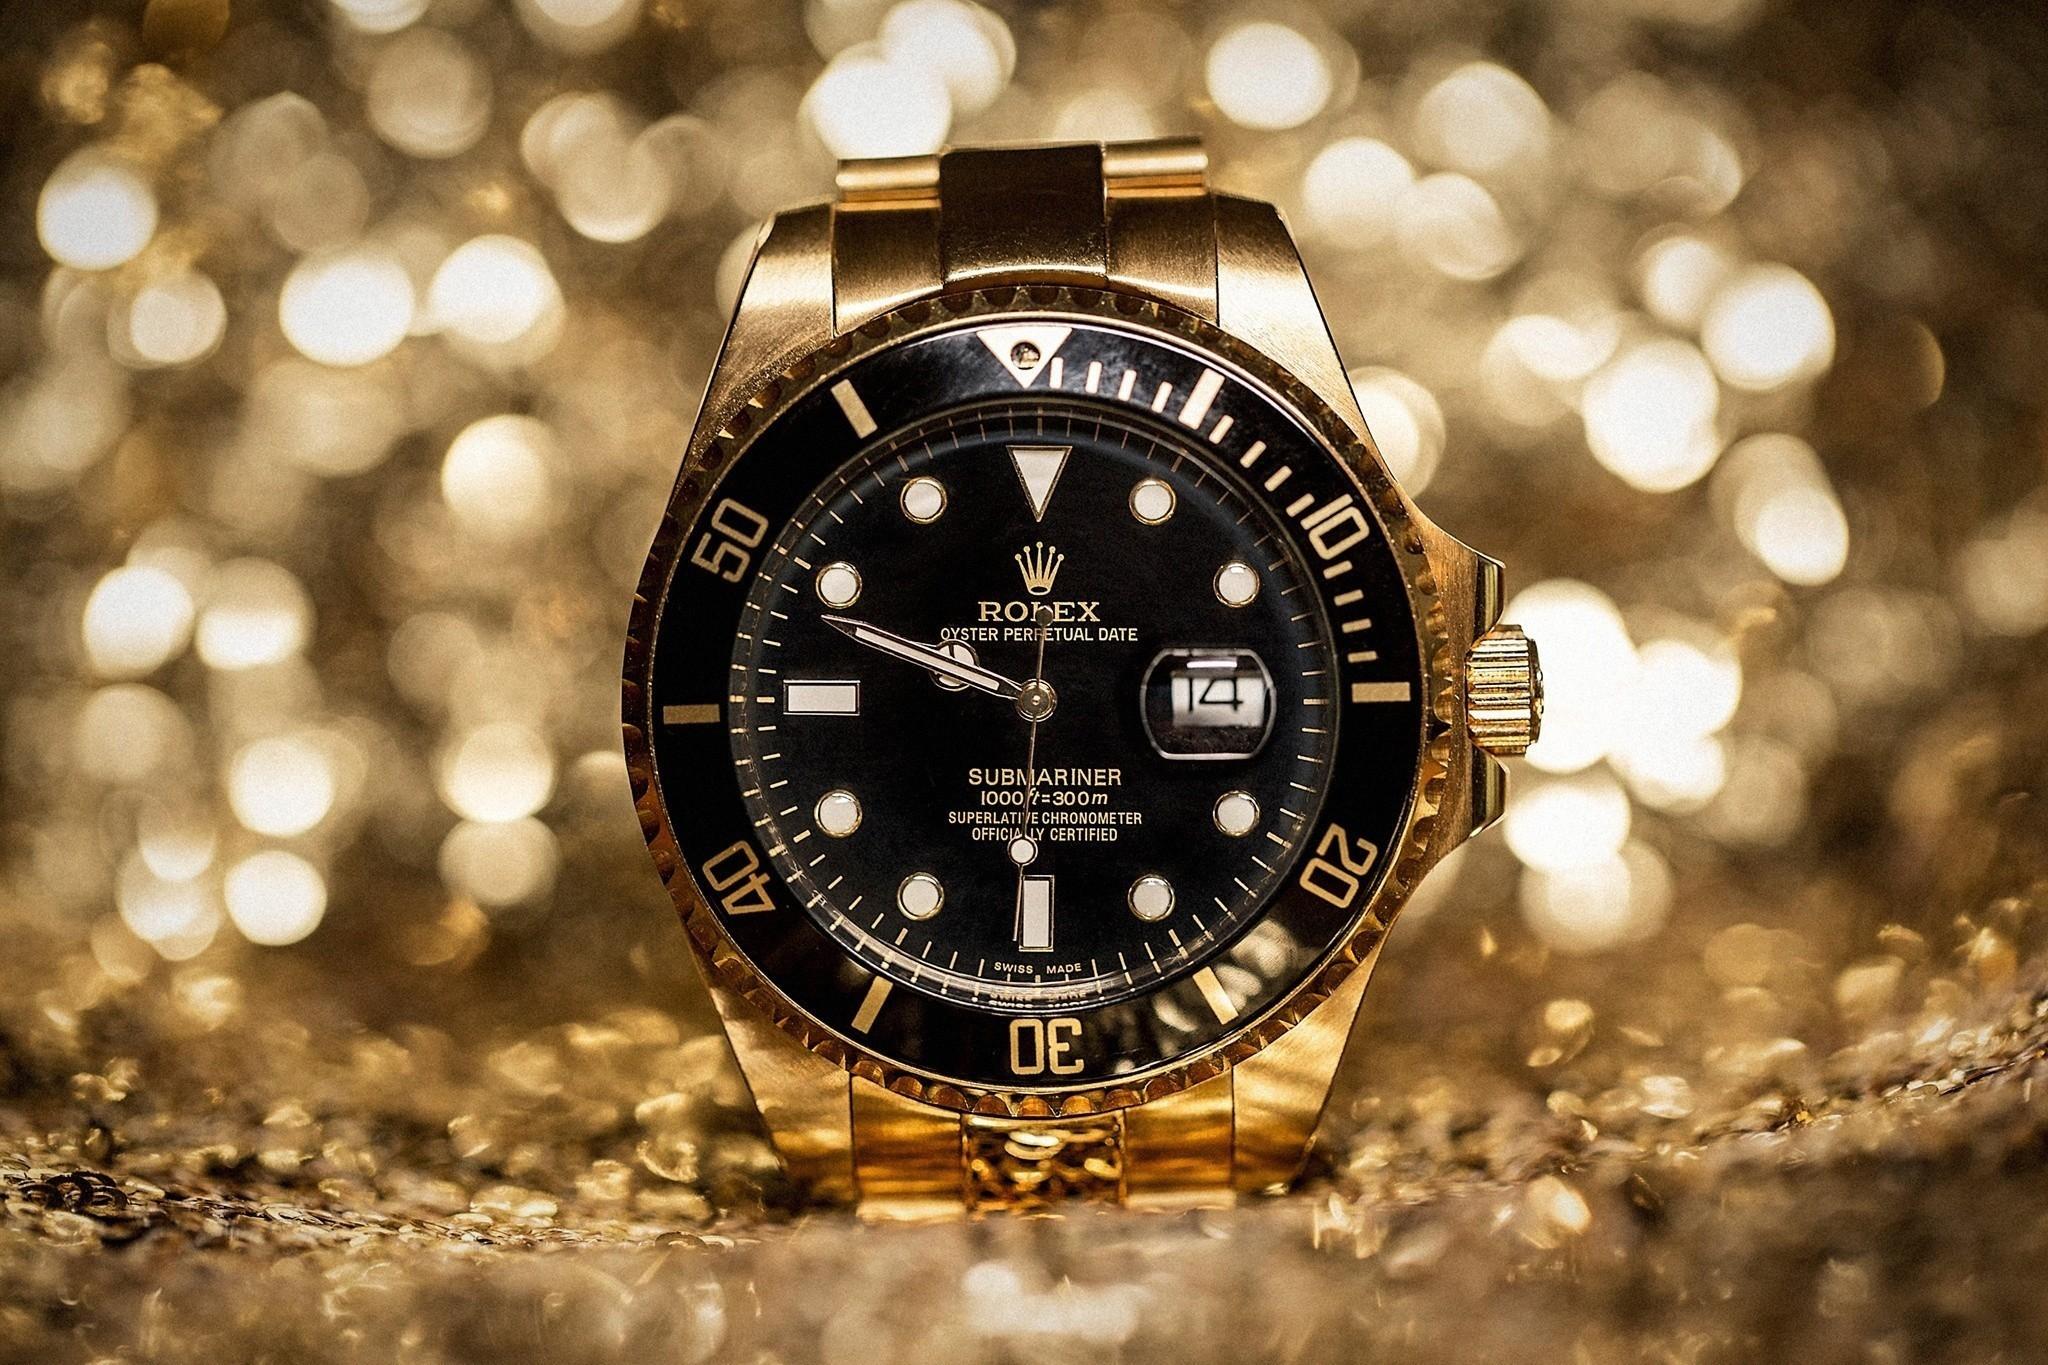 Res: 2048x1365, Rolex Golden Watch Wallpaper 11688